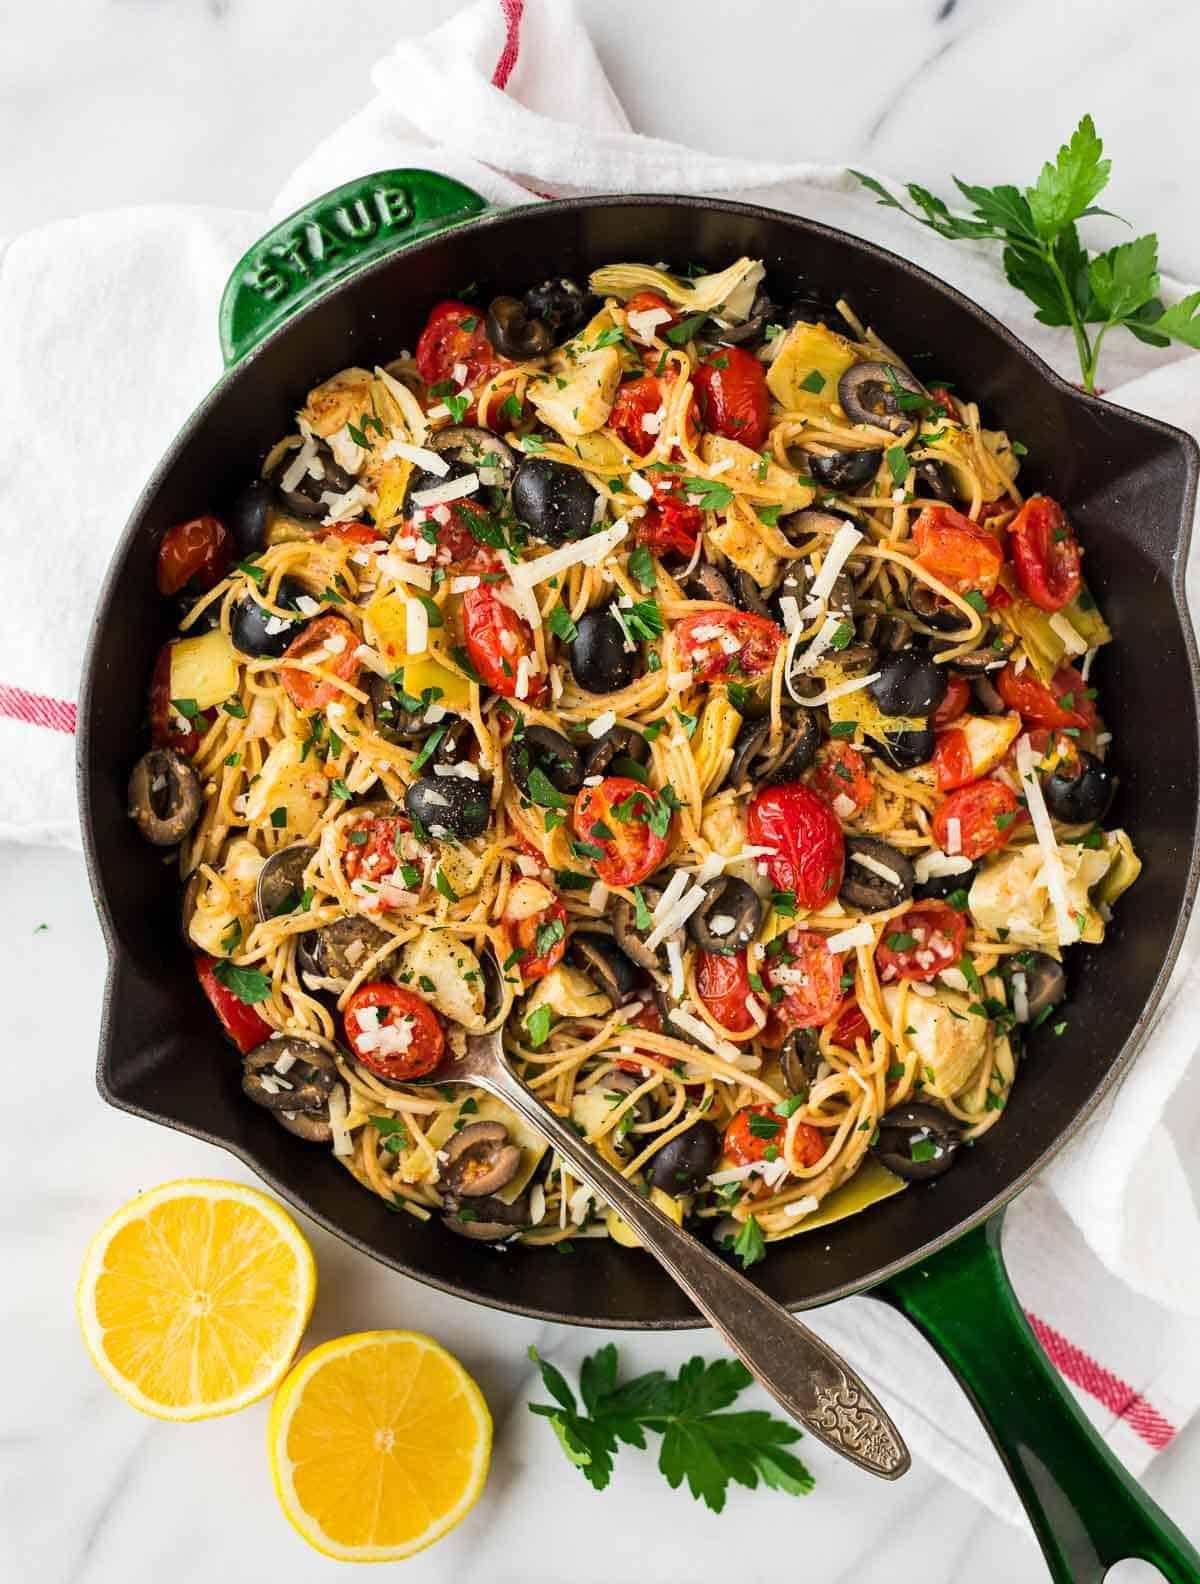 Healthy Homemade Pasta  Mediterranean Pasta